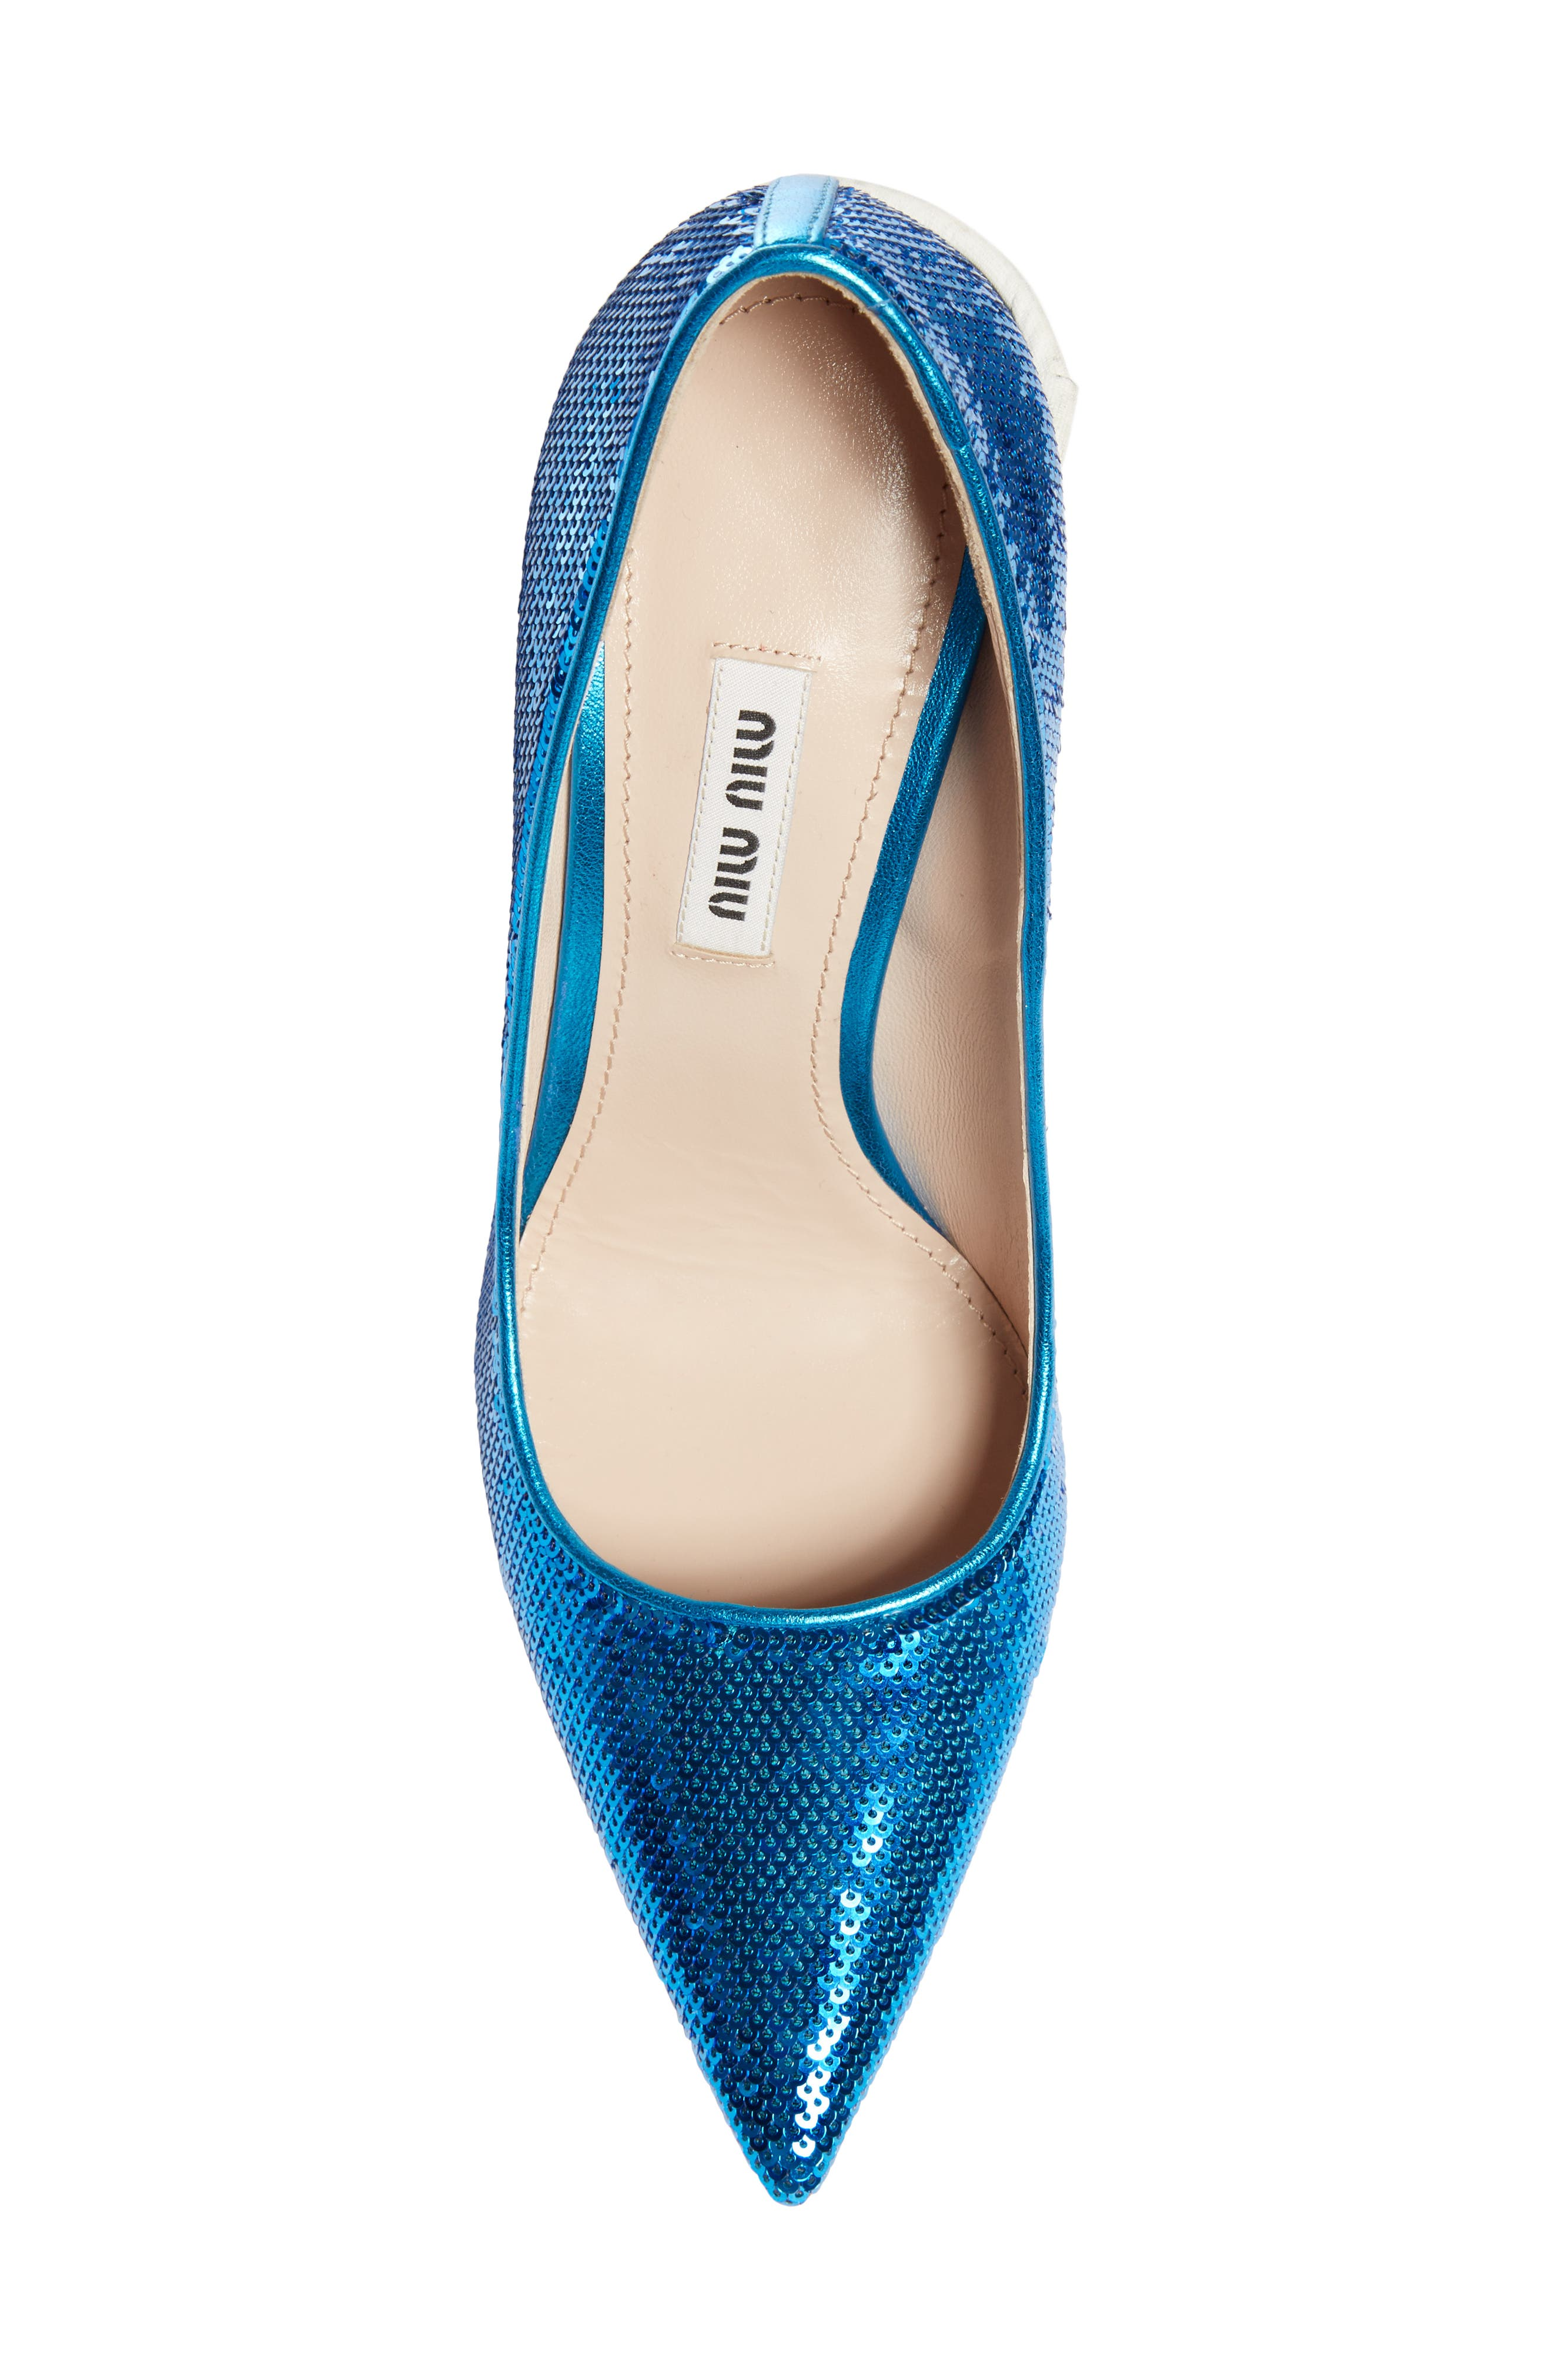 Sequin Pin Heel Pump,                             Alternate thumbnail 5, color,                             MAREA BLUE